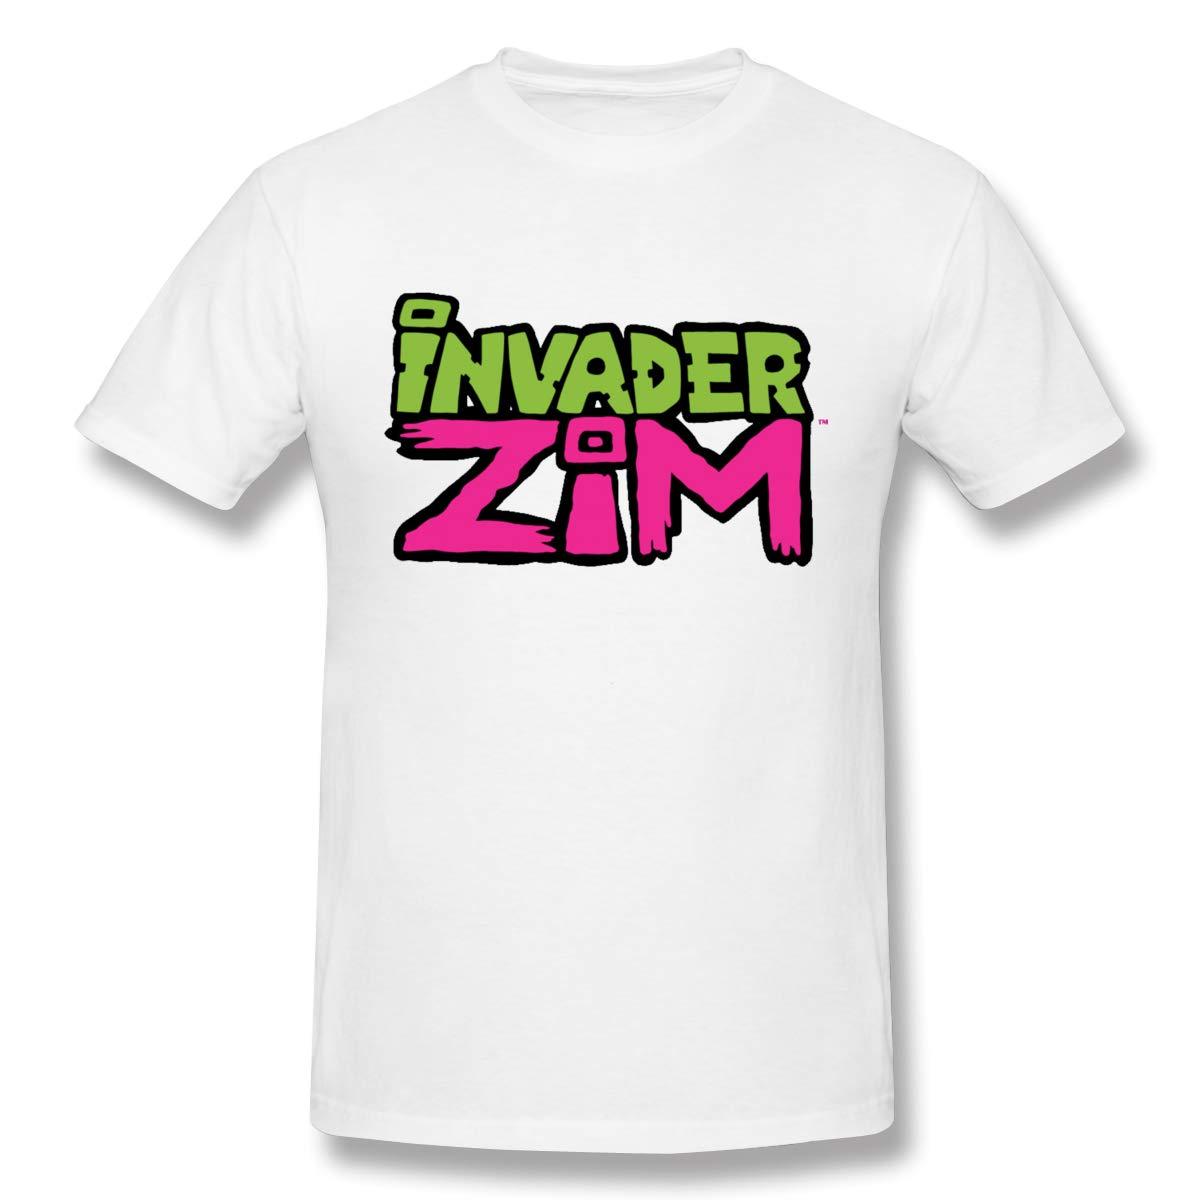 Lerzincser, camiseta de hombre, suave, Invader, Zim Gir Doom, estampado con cuello redondo, camisetas de manga corta, transpirable